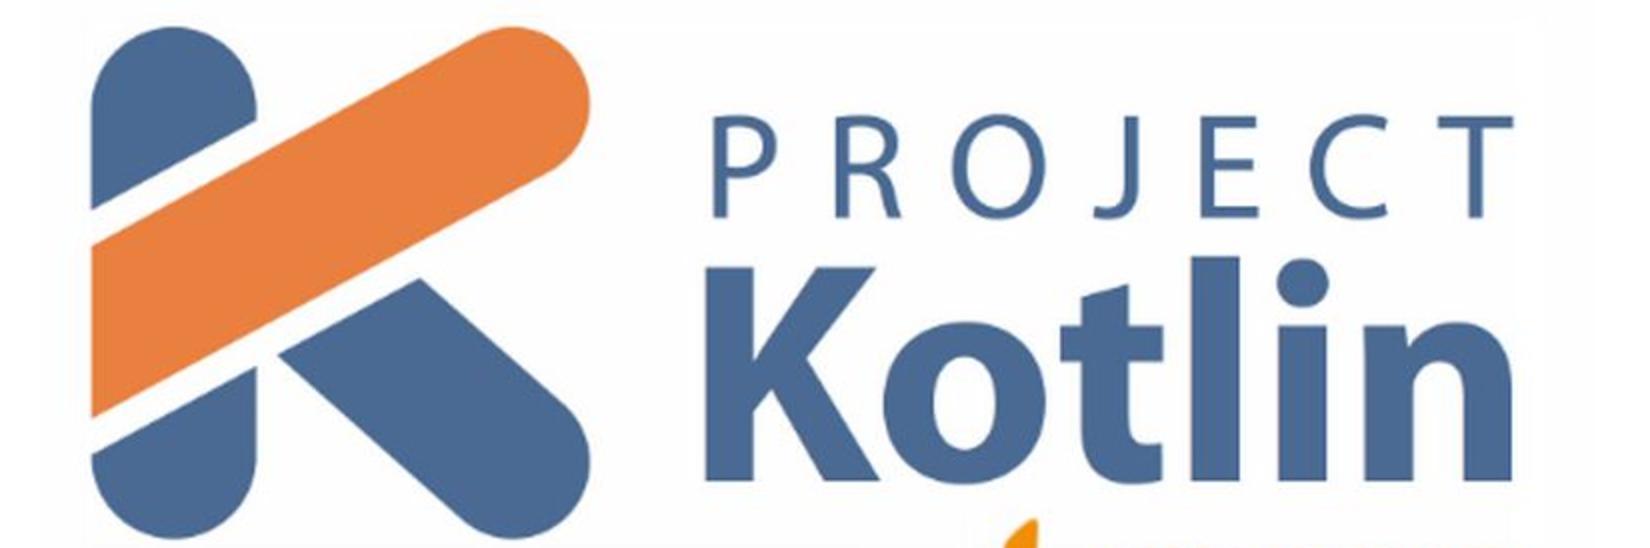 Kotlin - by 关键字介绍